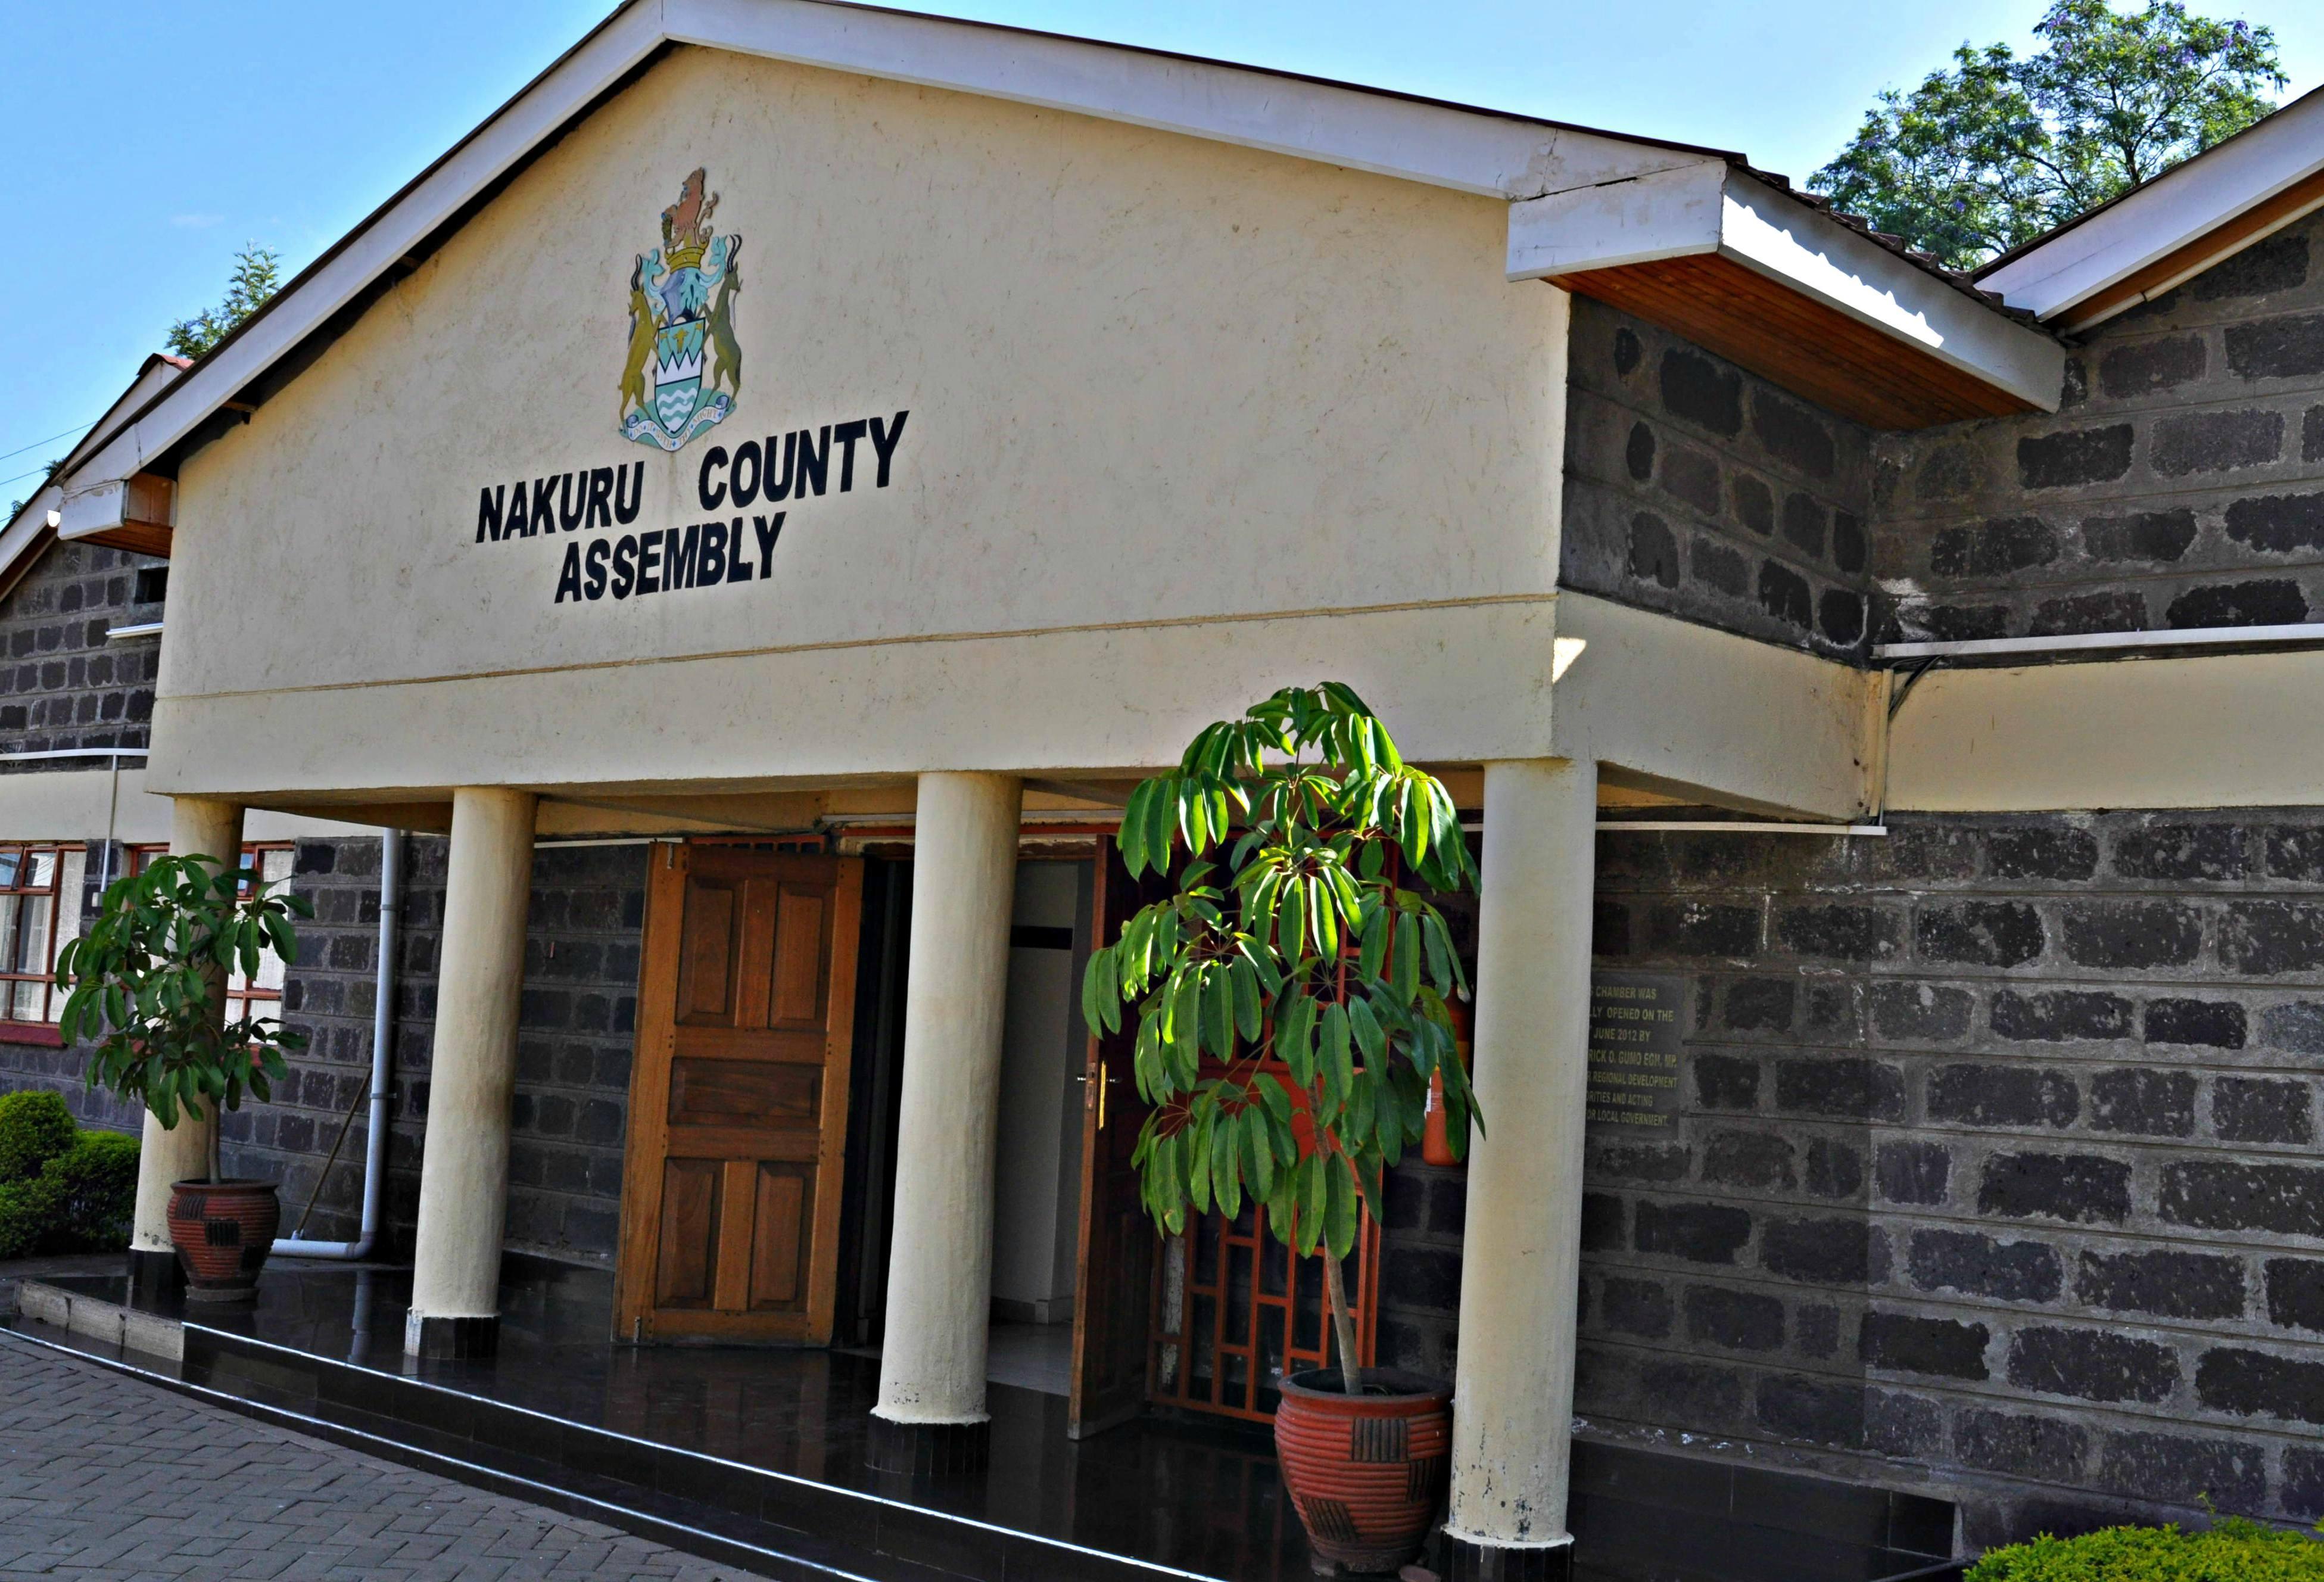 Nakuru County Assembly